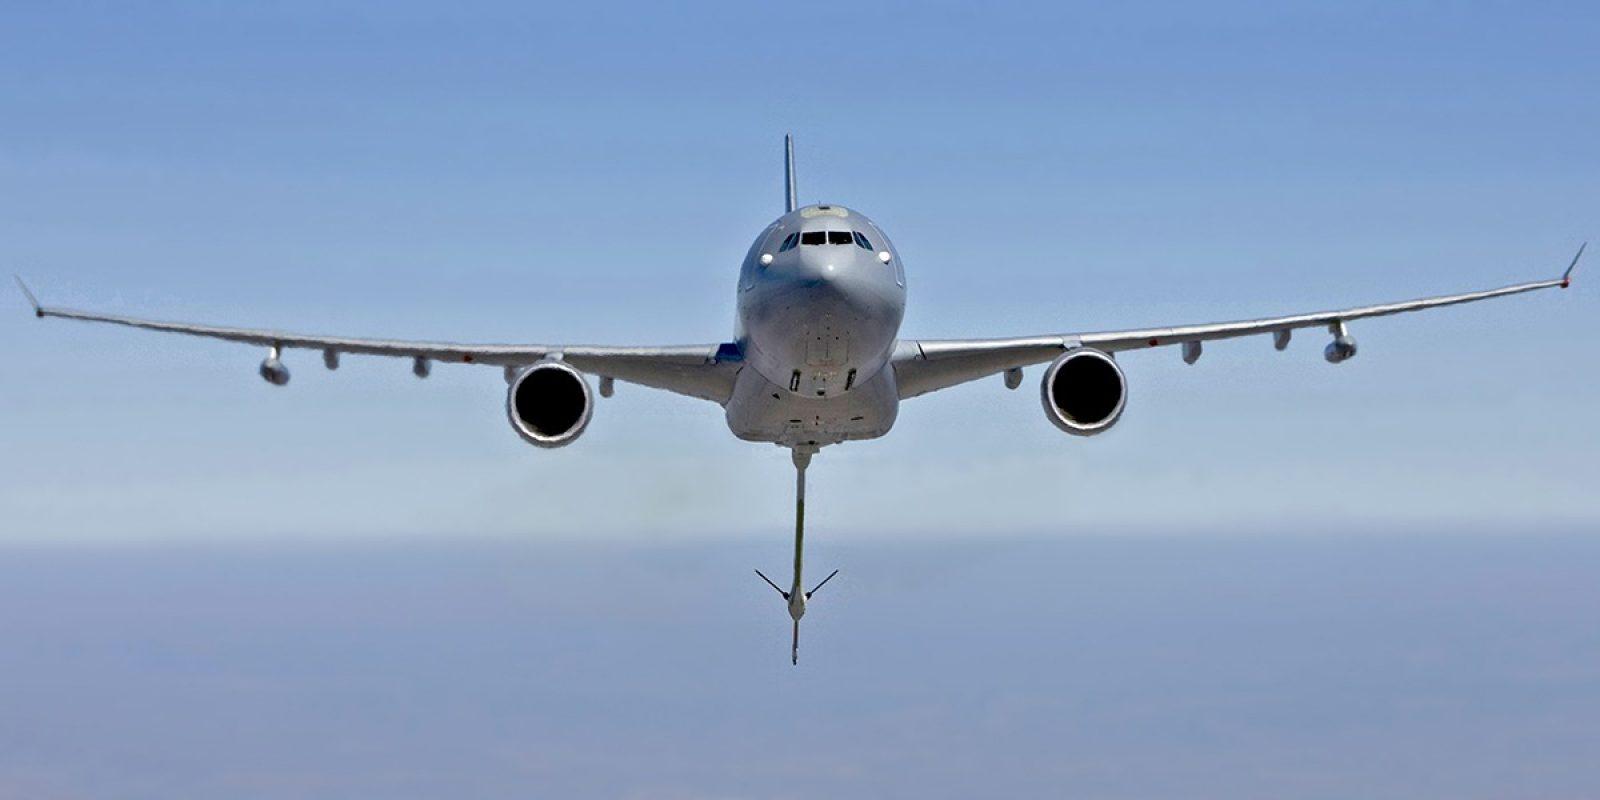 201904_EART001_Airbus